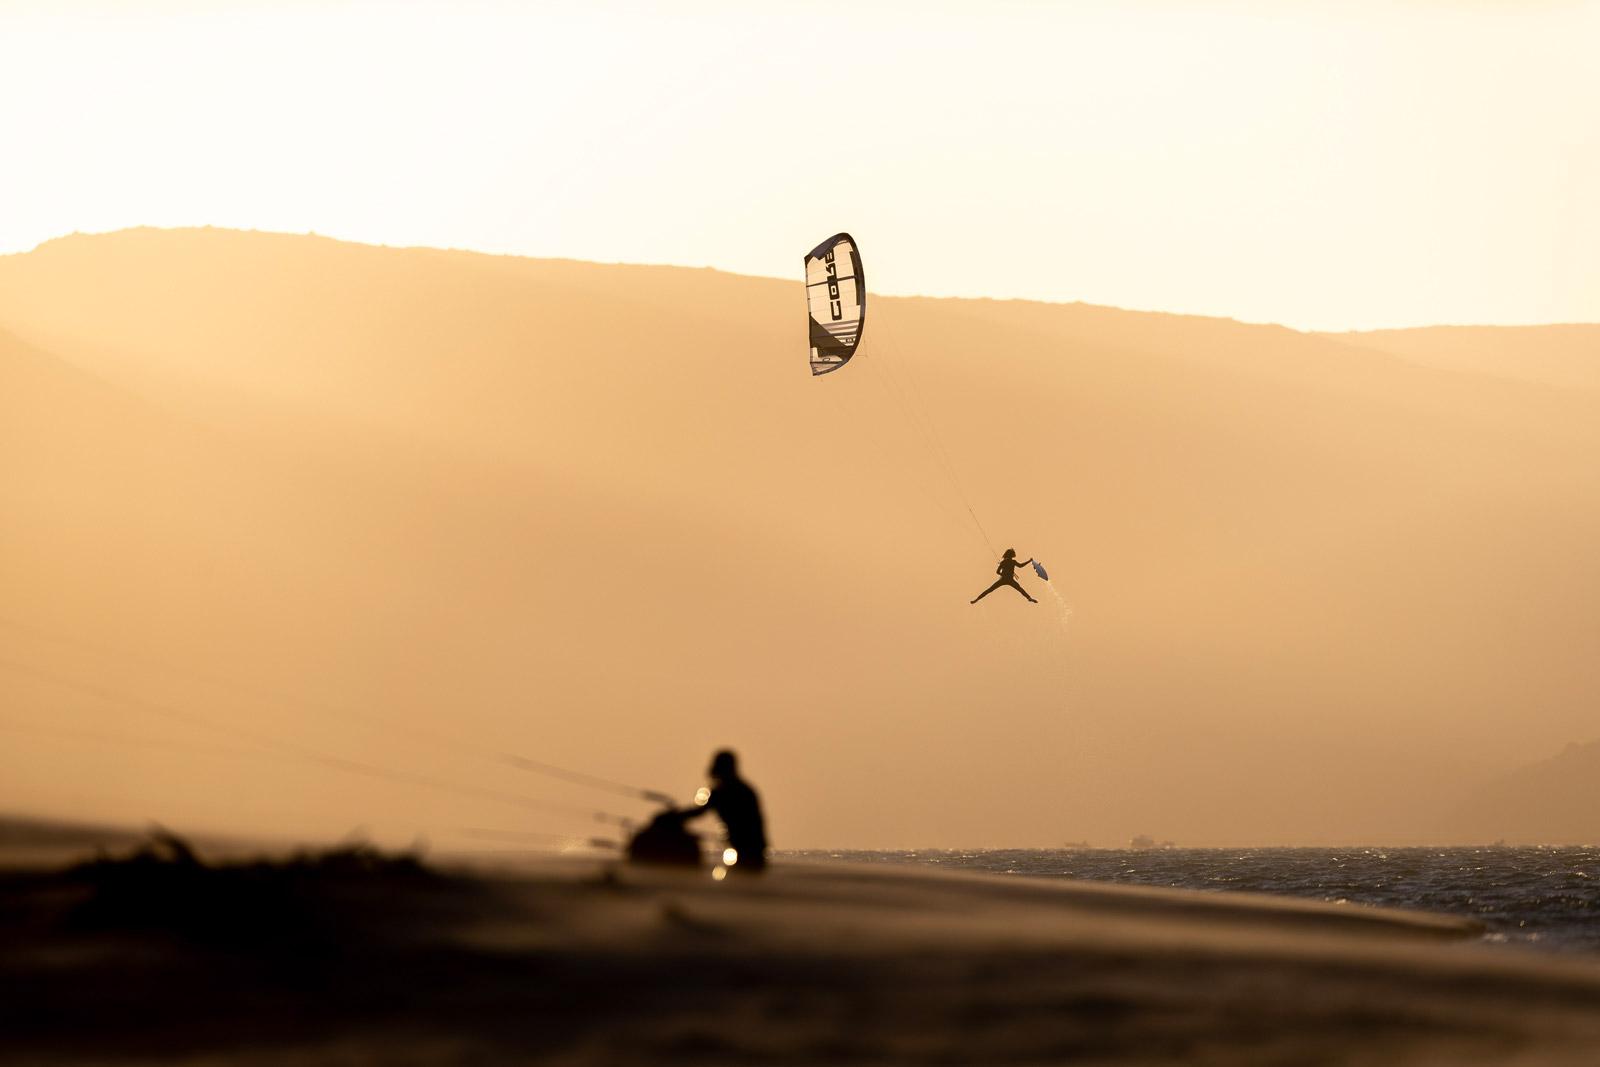 Janek soaring on the XR7